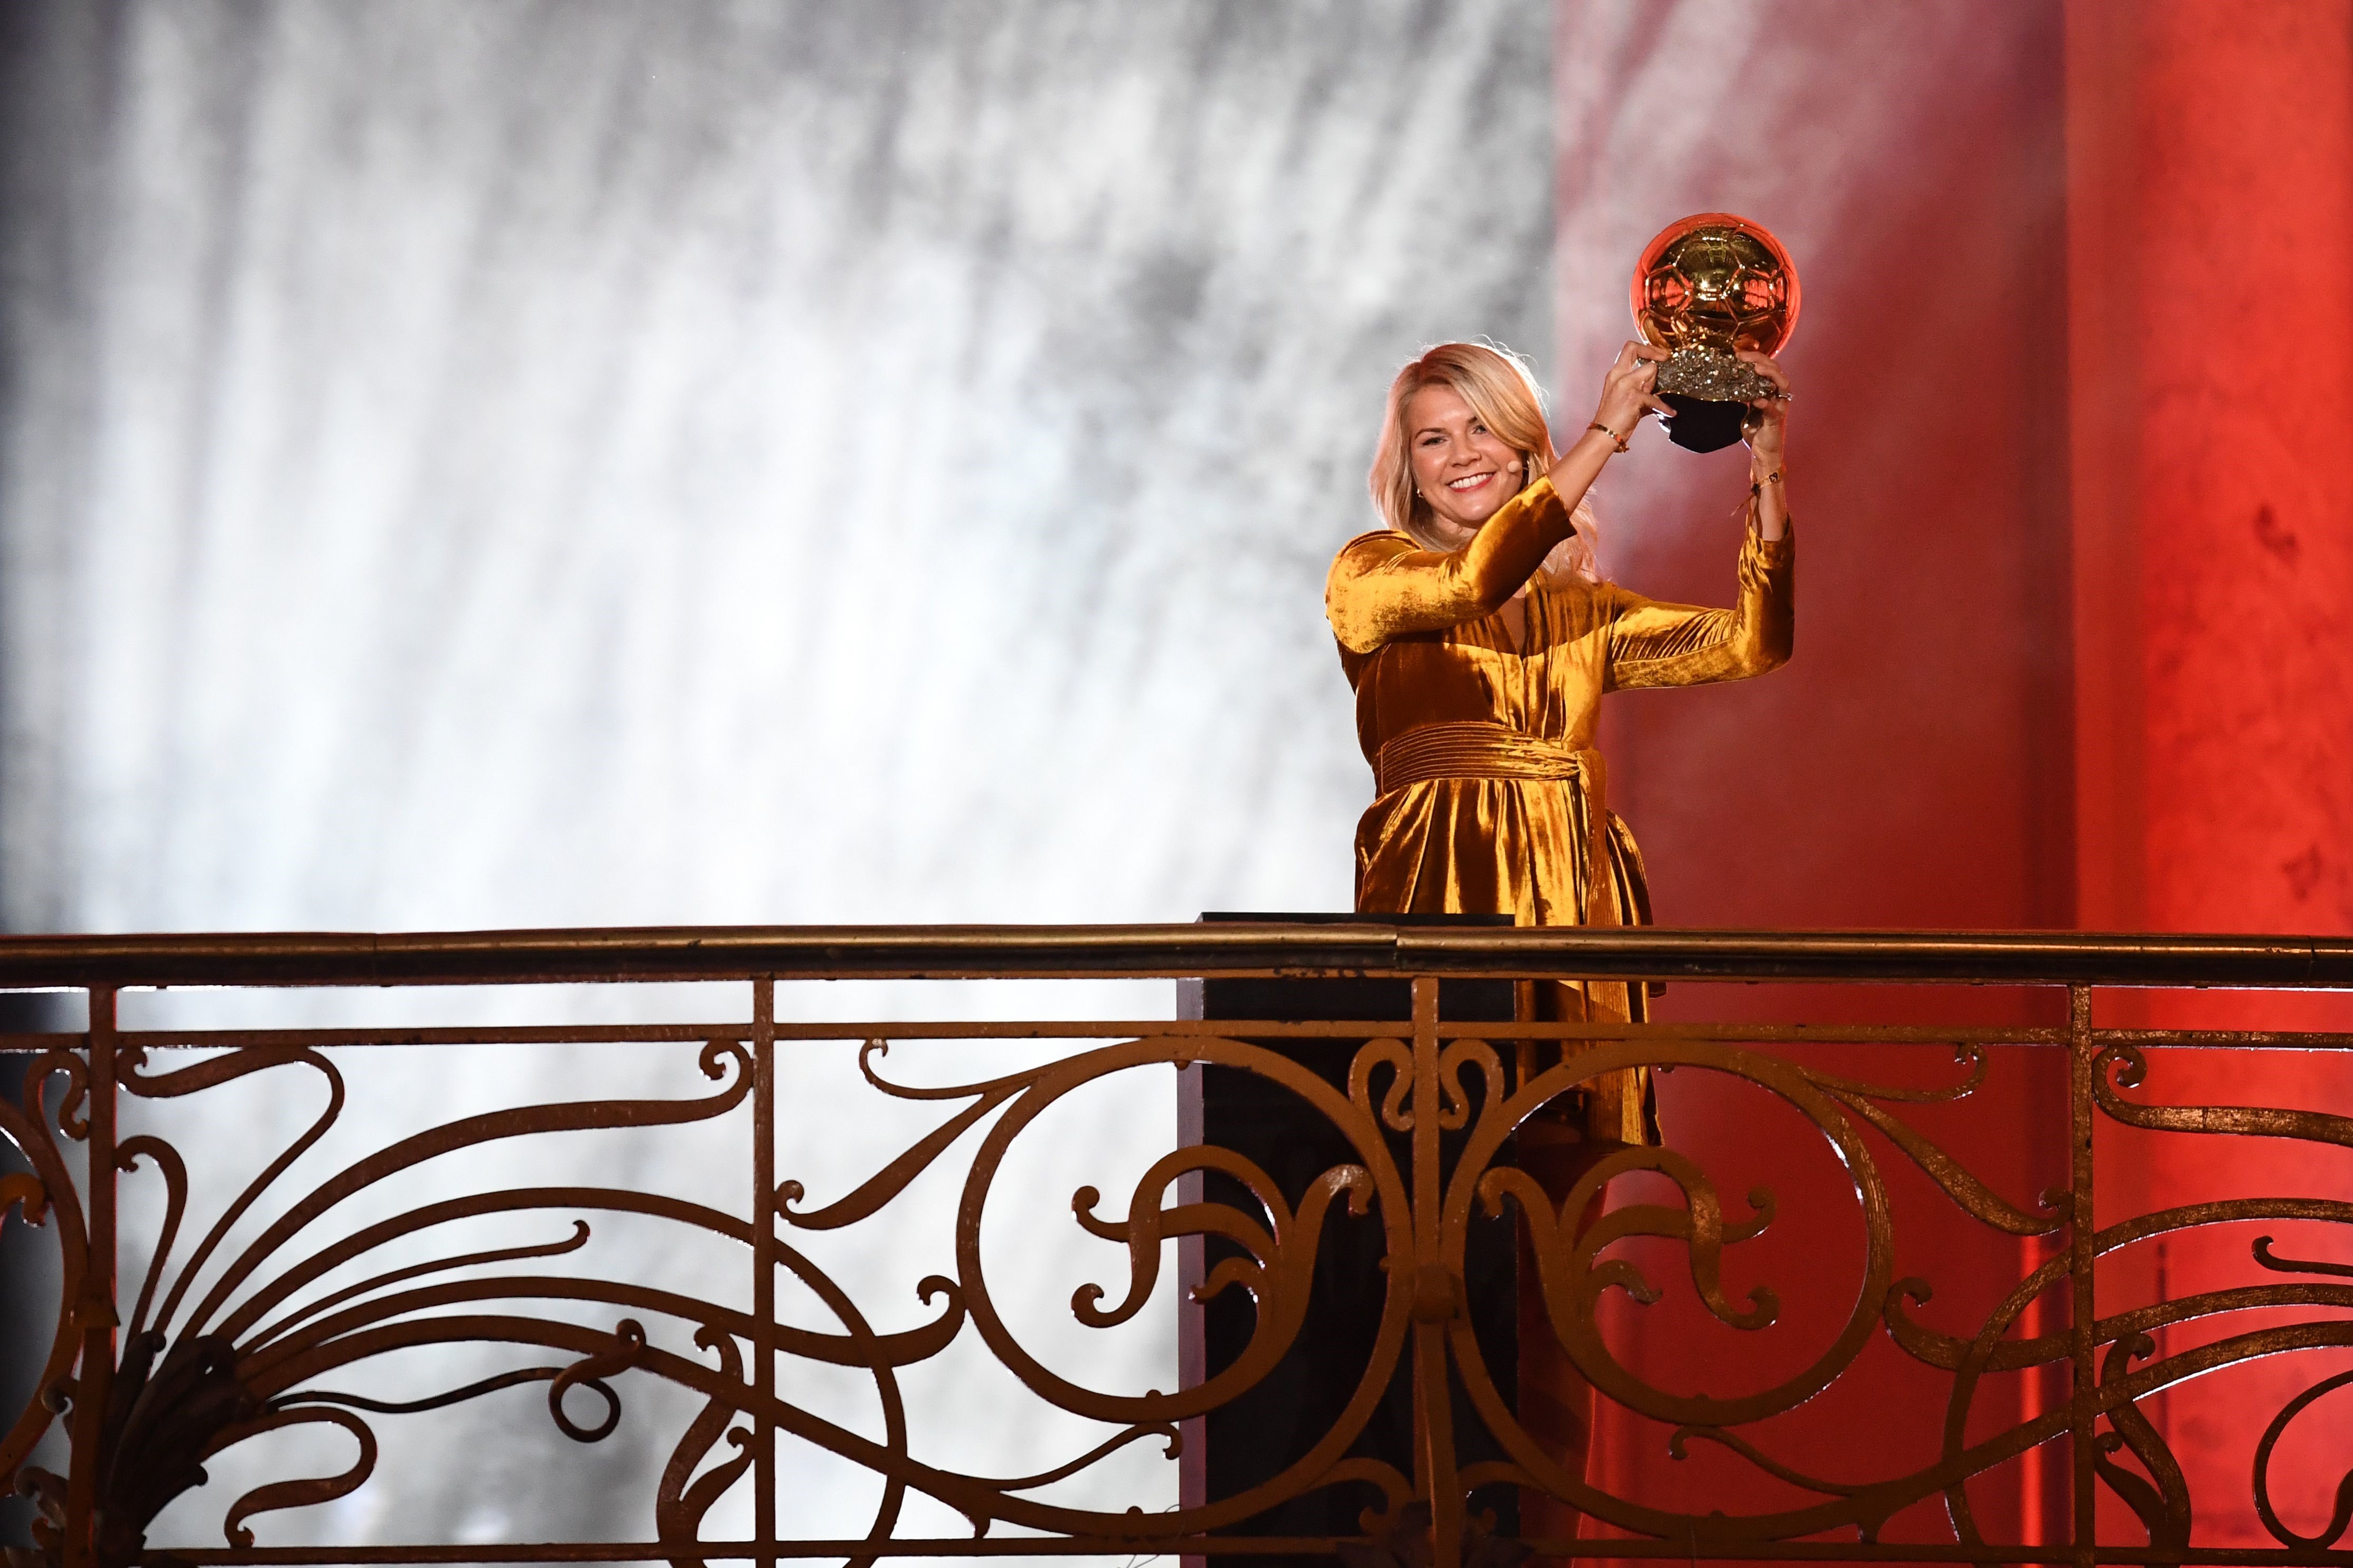 Ada Hegerberg - Ballon d'Or